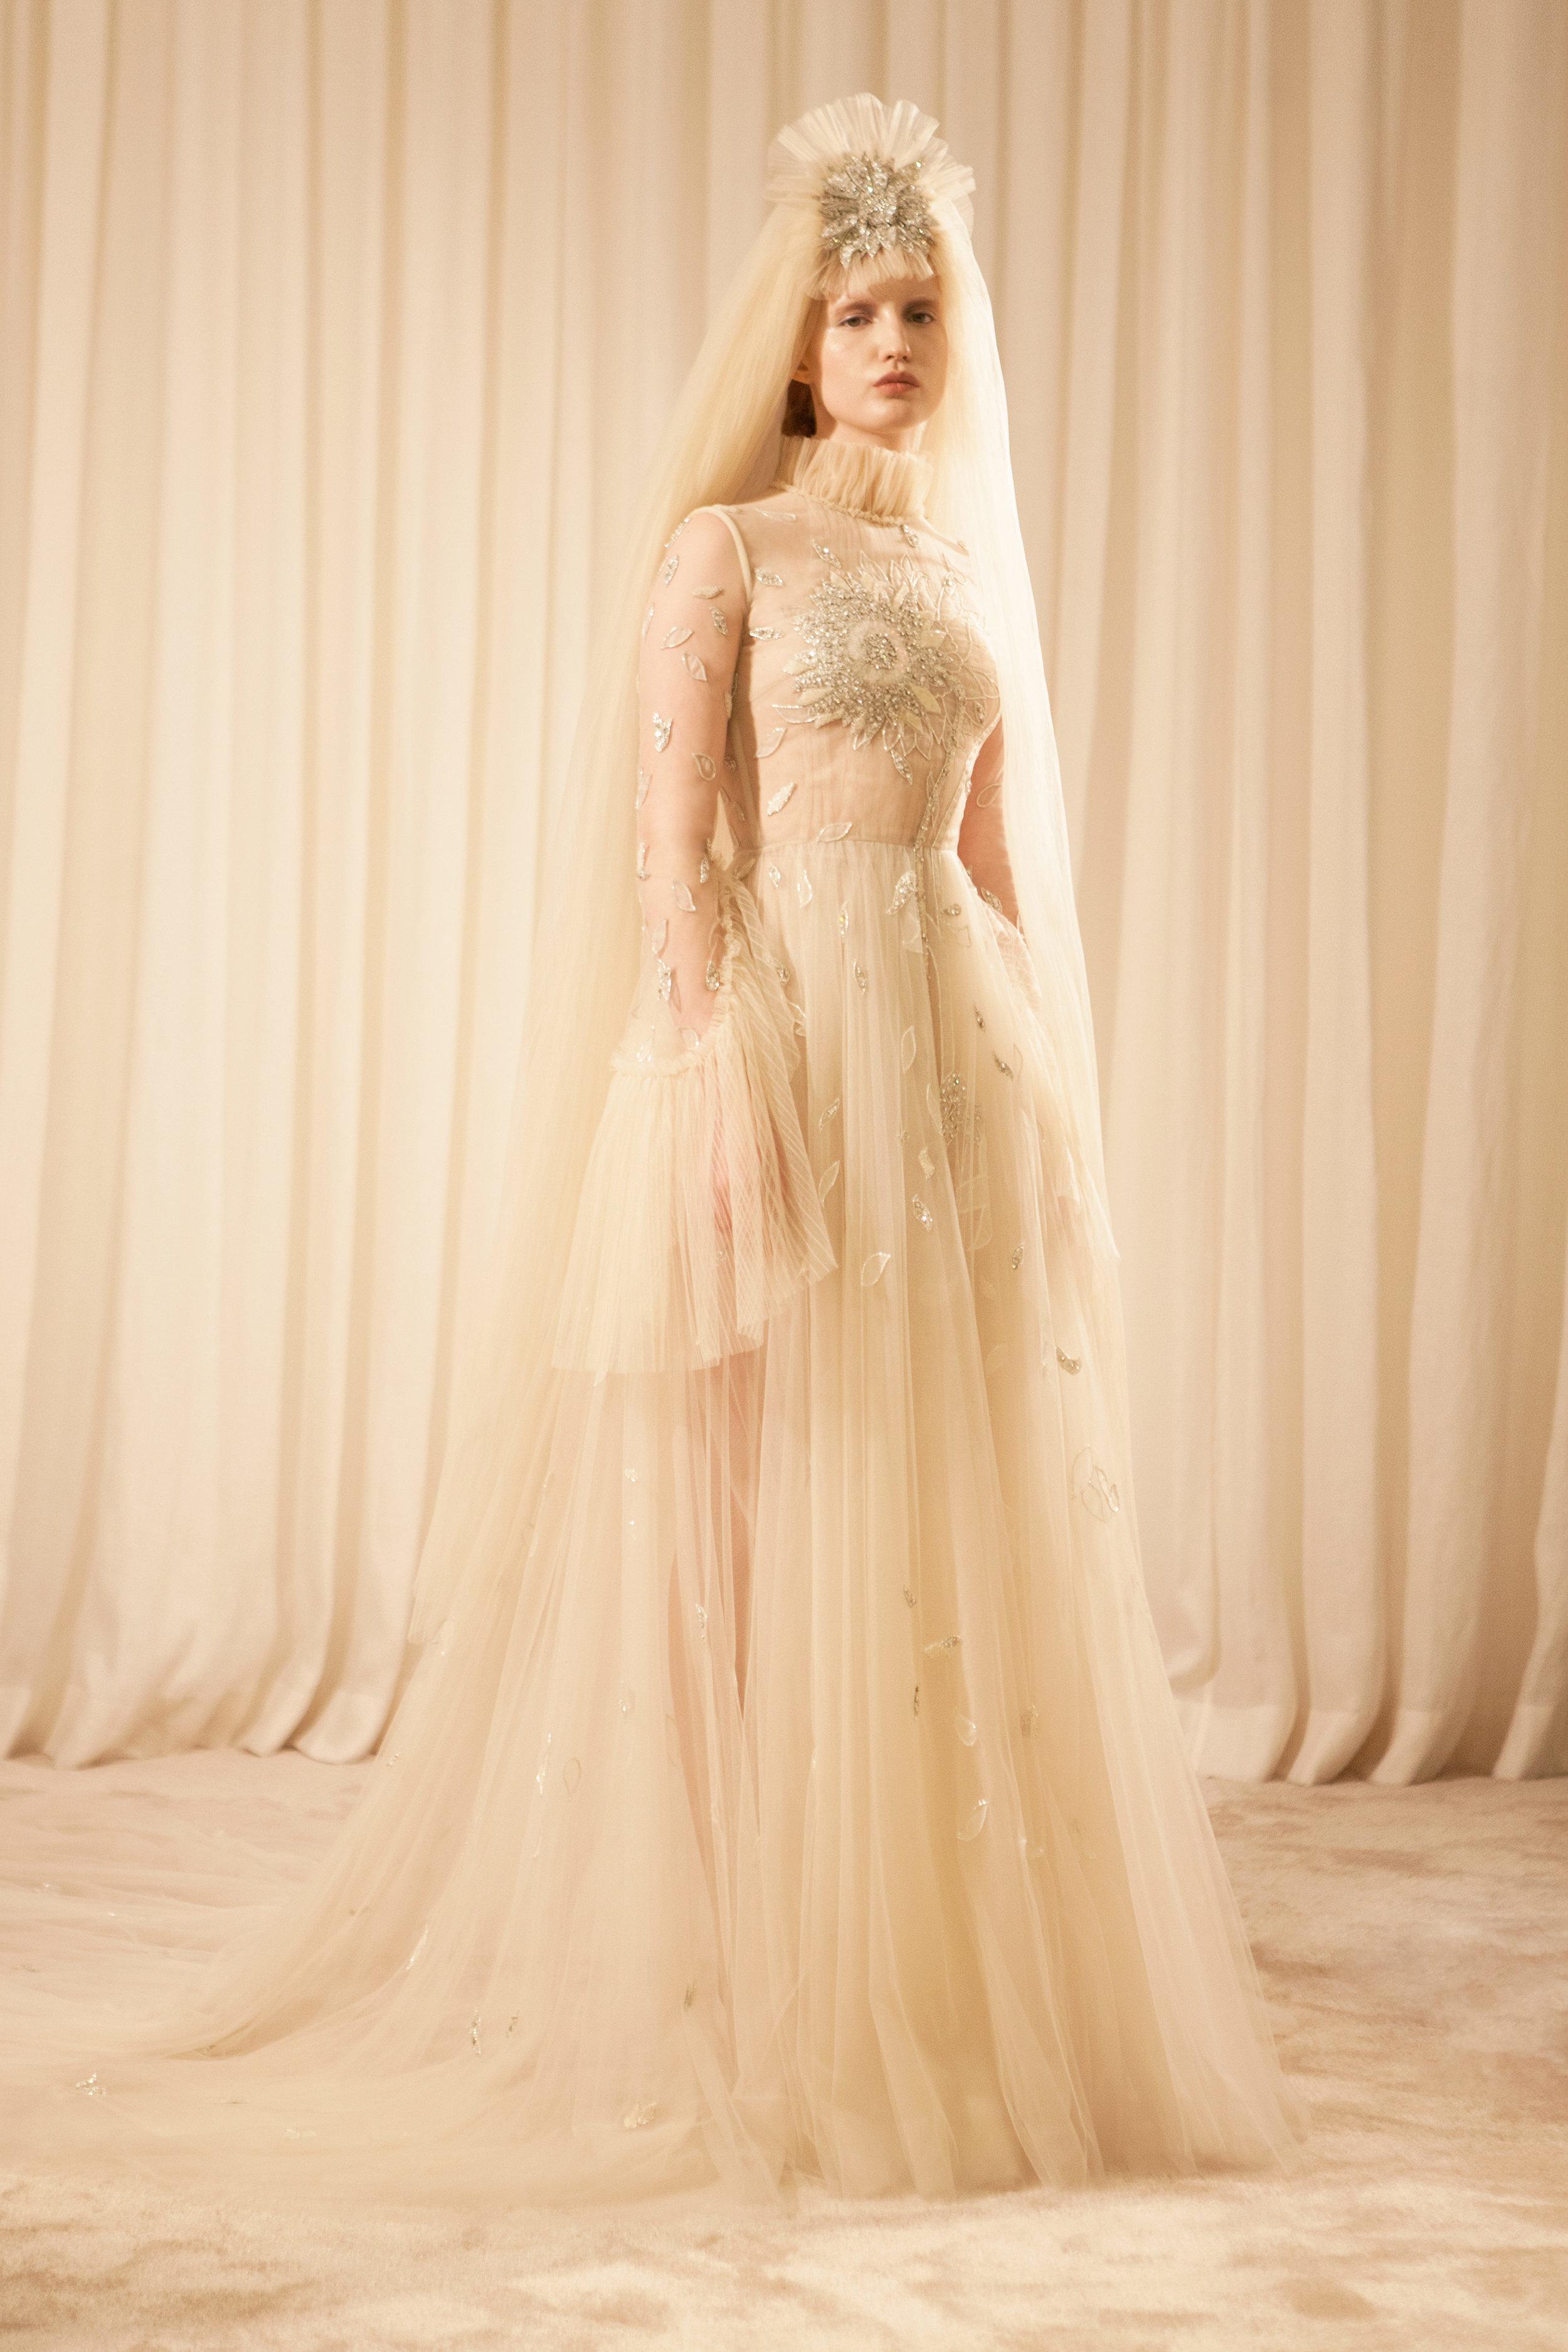 SandraMansour-S1-Lookbook-Bridal-07.jpg